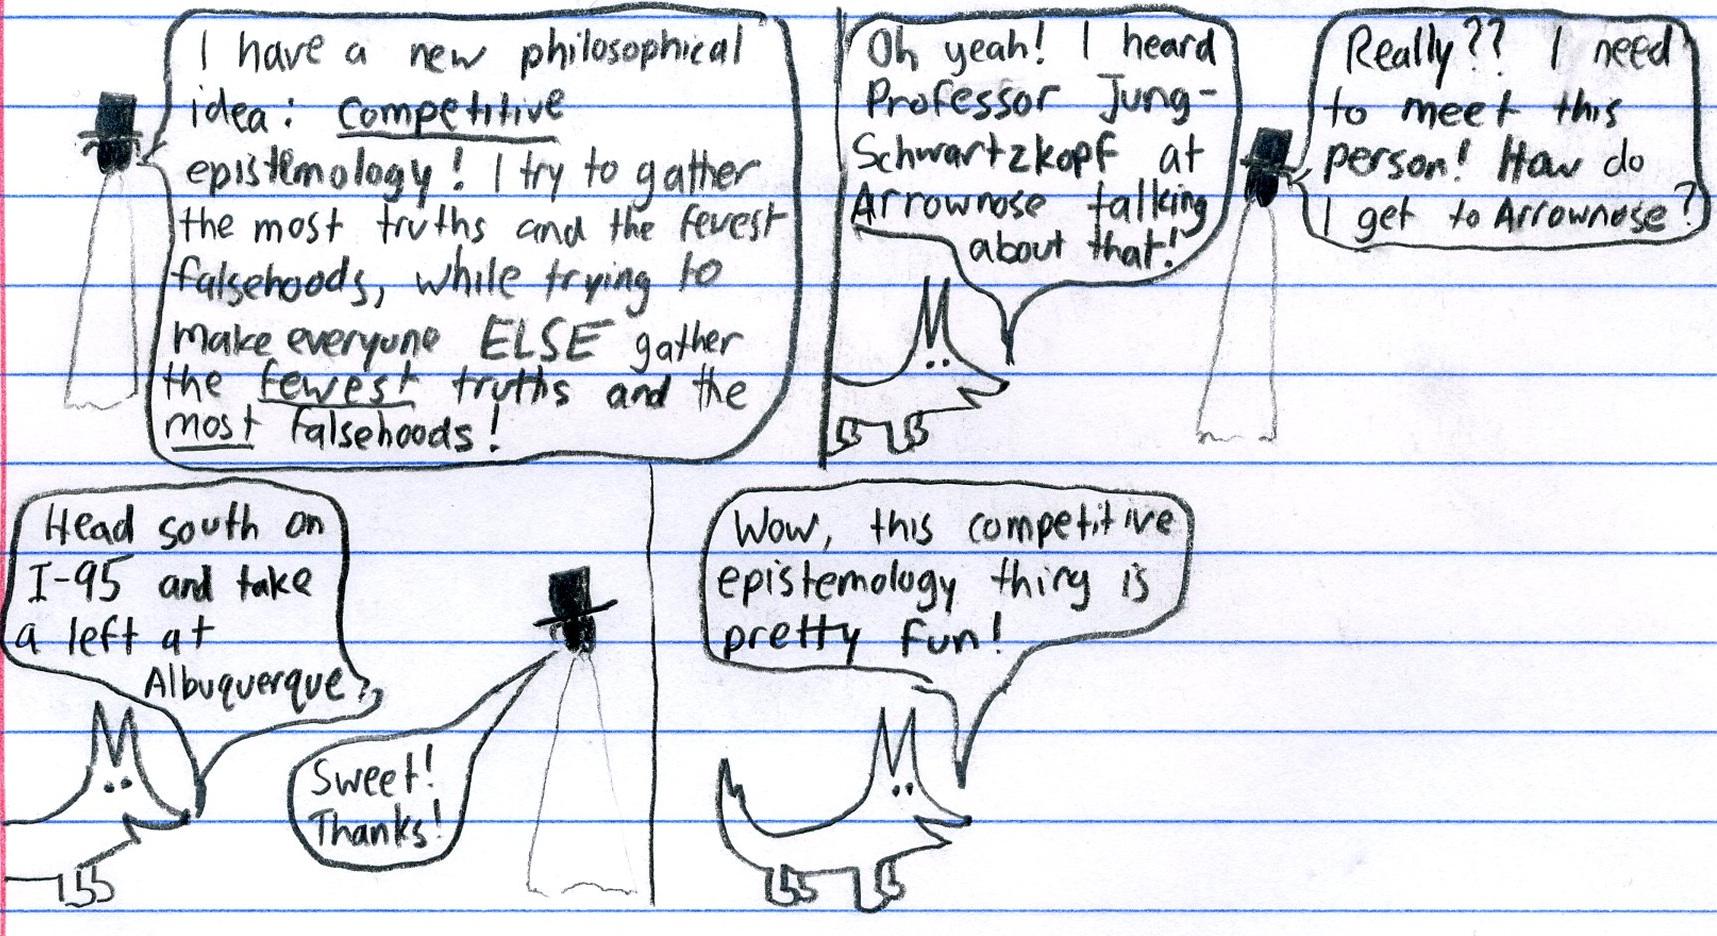 Competitive Epistemology